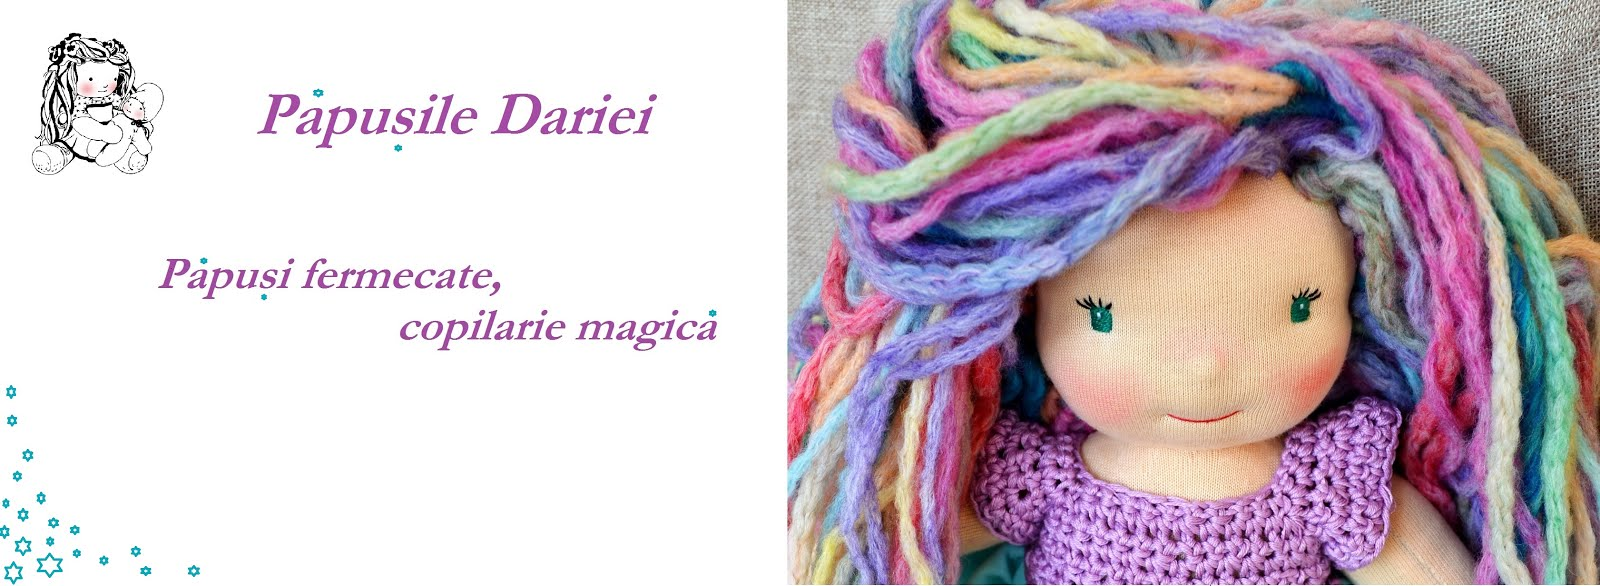 Papusile Dariei.